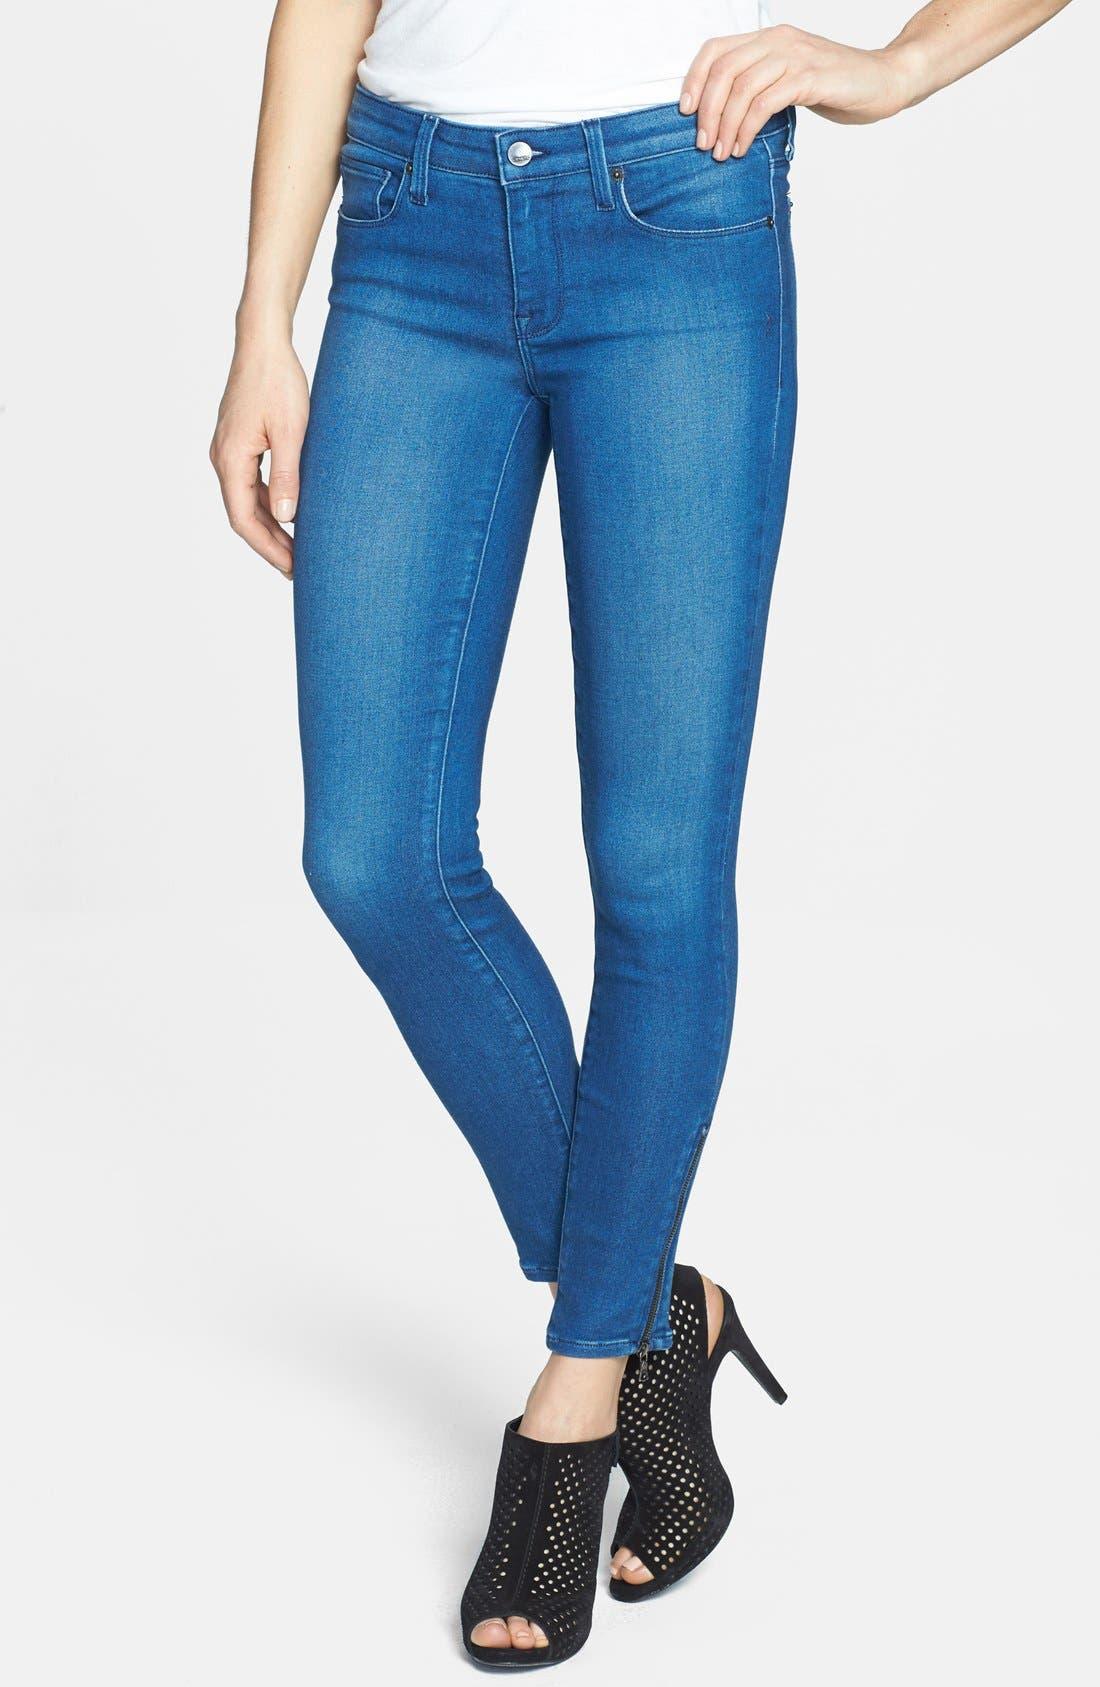 Alternate Image 1 Selected - Genetic 'James' Skinny Ankle Jeans (Impact)